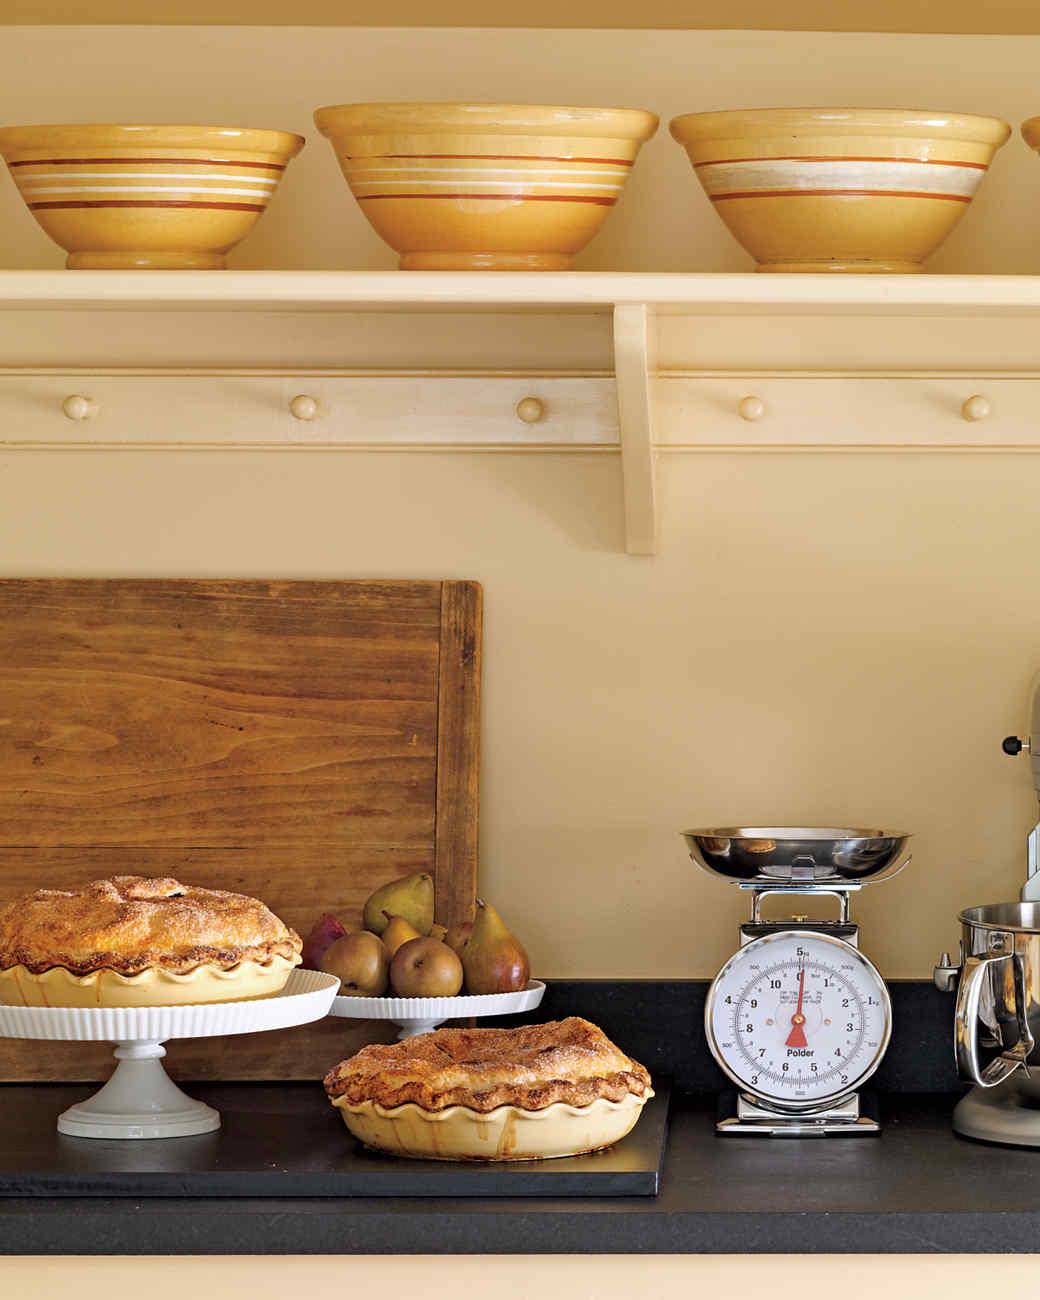 marthas-kitchen-mixing-bowls-mld107949.jpg